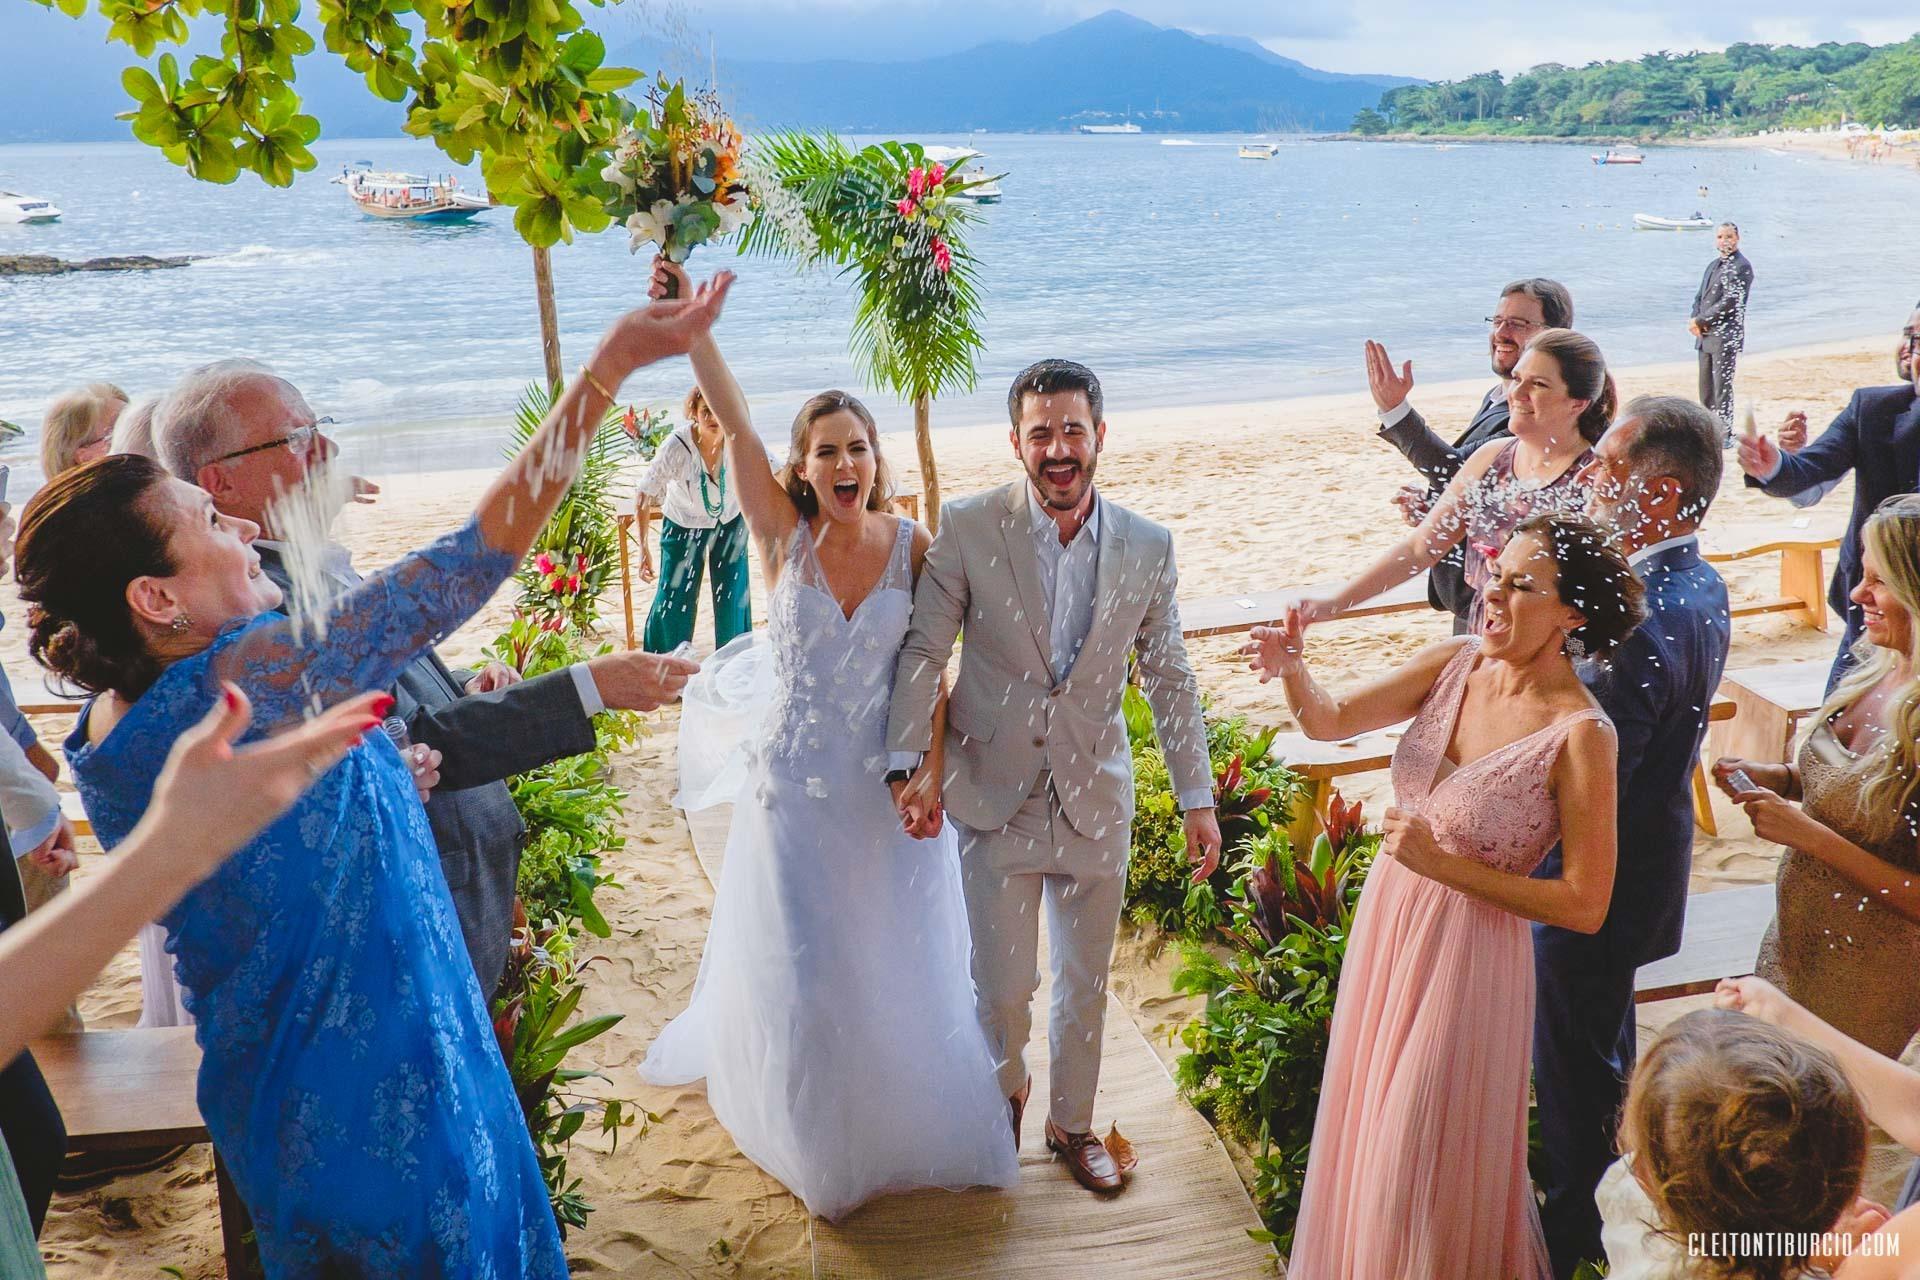 Contate Cleiton Tiburcio - Fotografia de Casamento